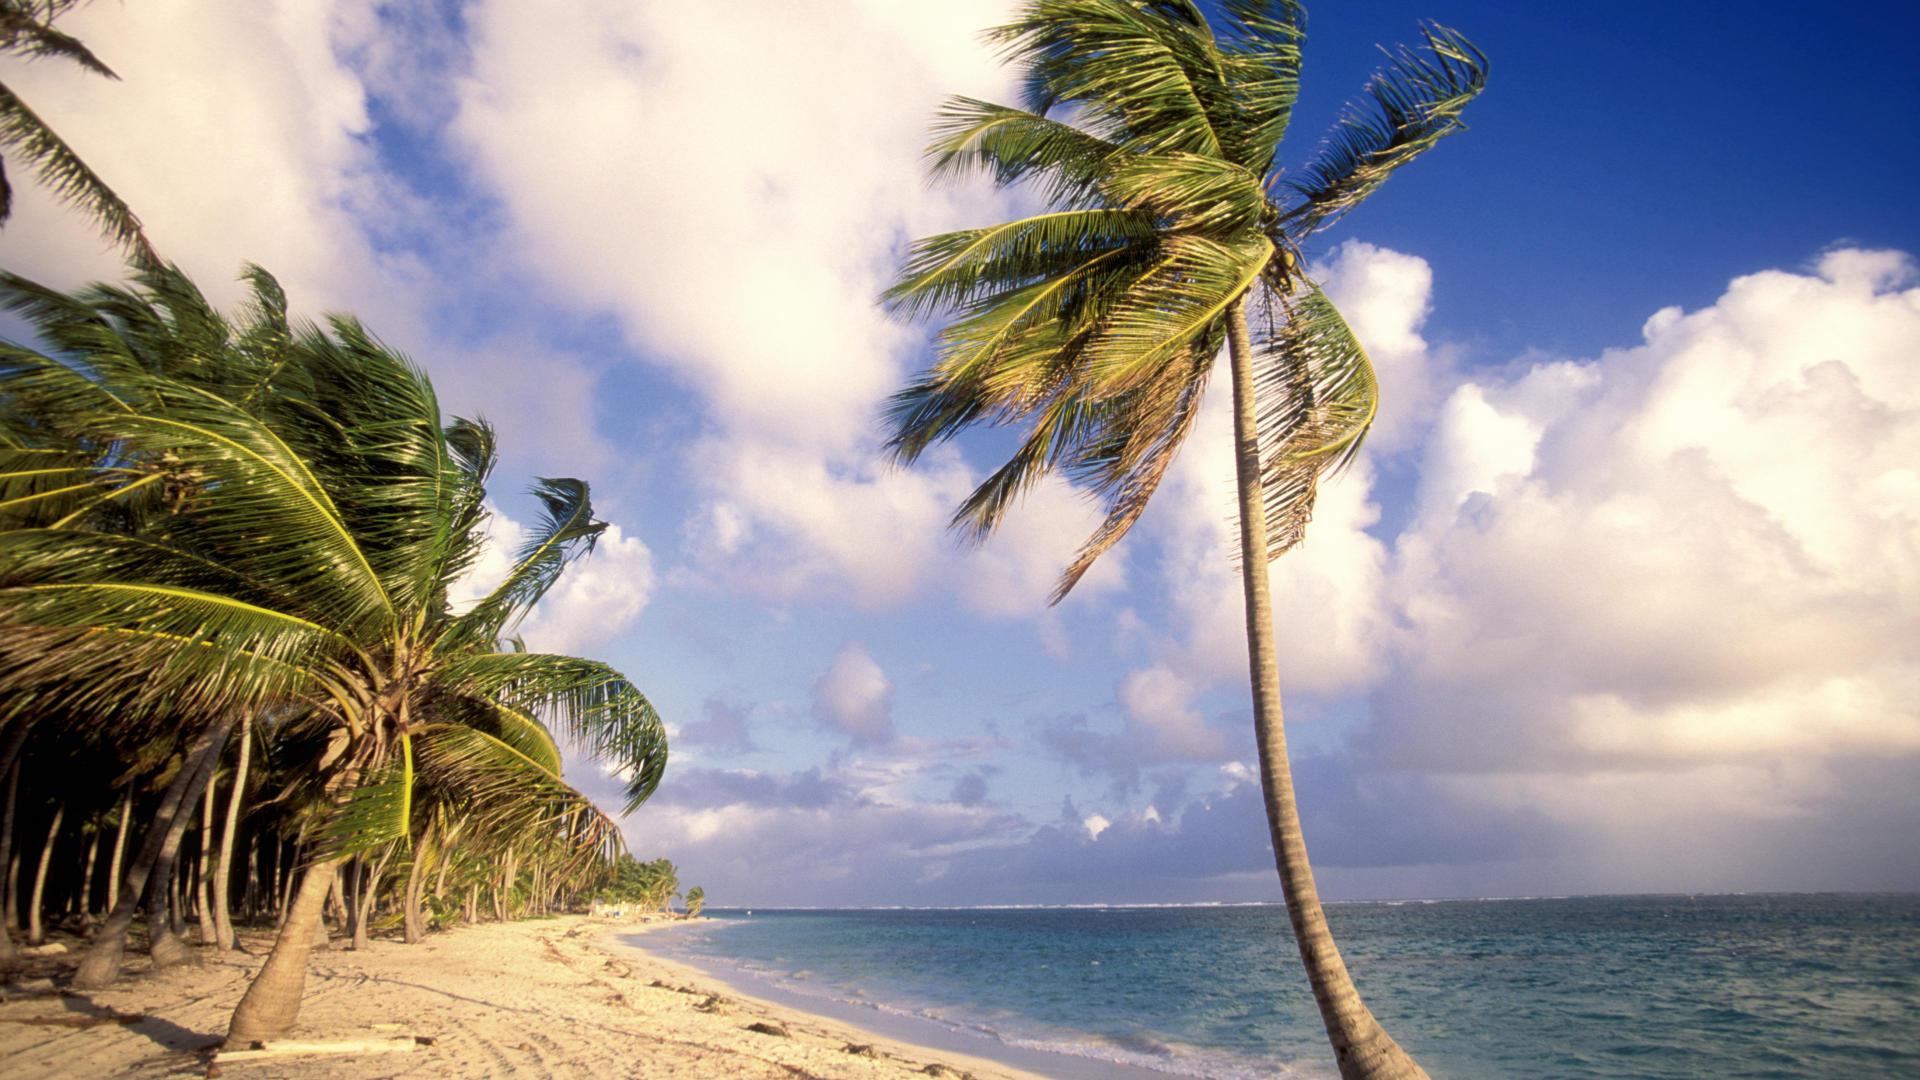 backgrounds desktop republic wallpaper punta beach dominican 1920x1080